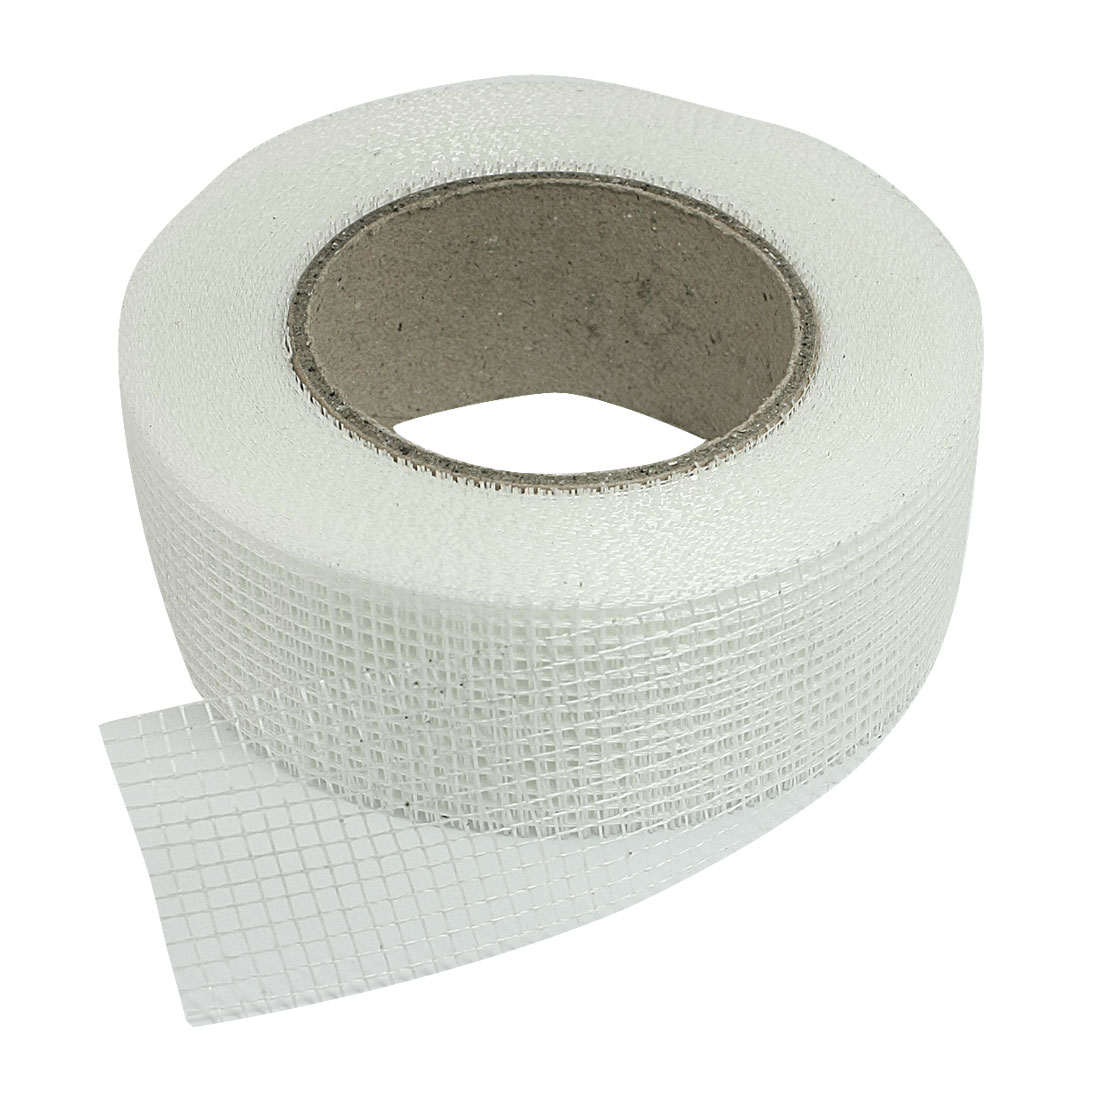 "Self Adhesive 1.8"" Width White Fiberglass Mesh Joint Tape"